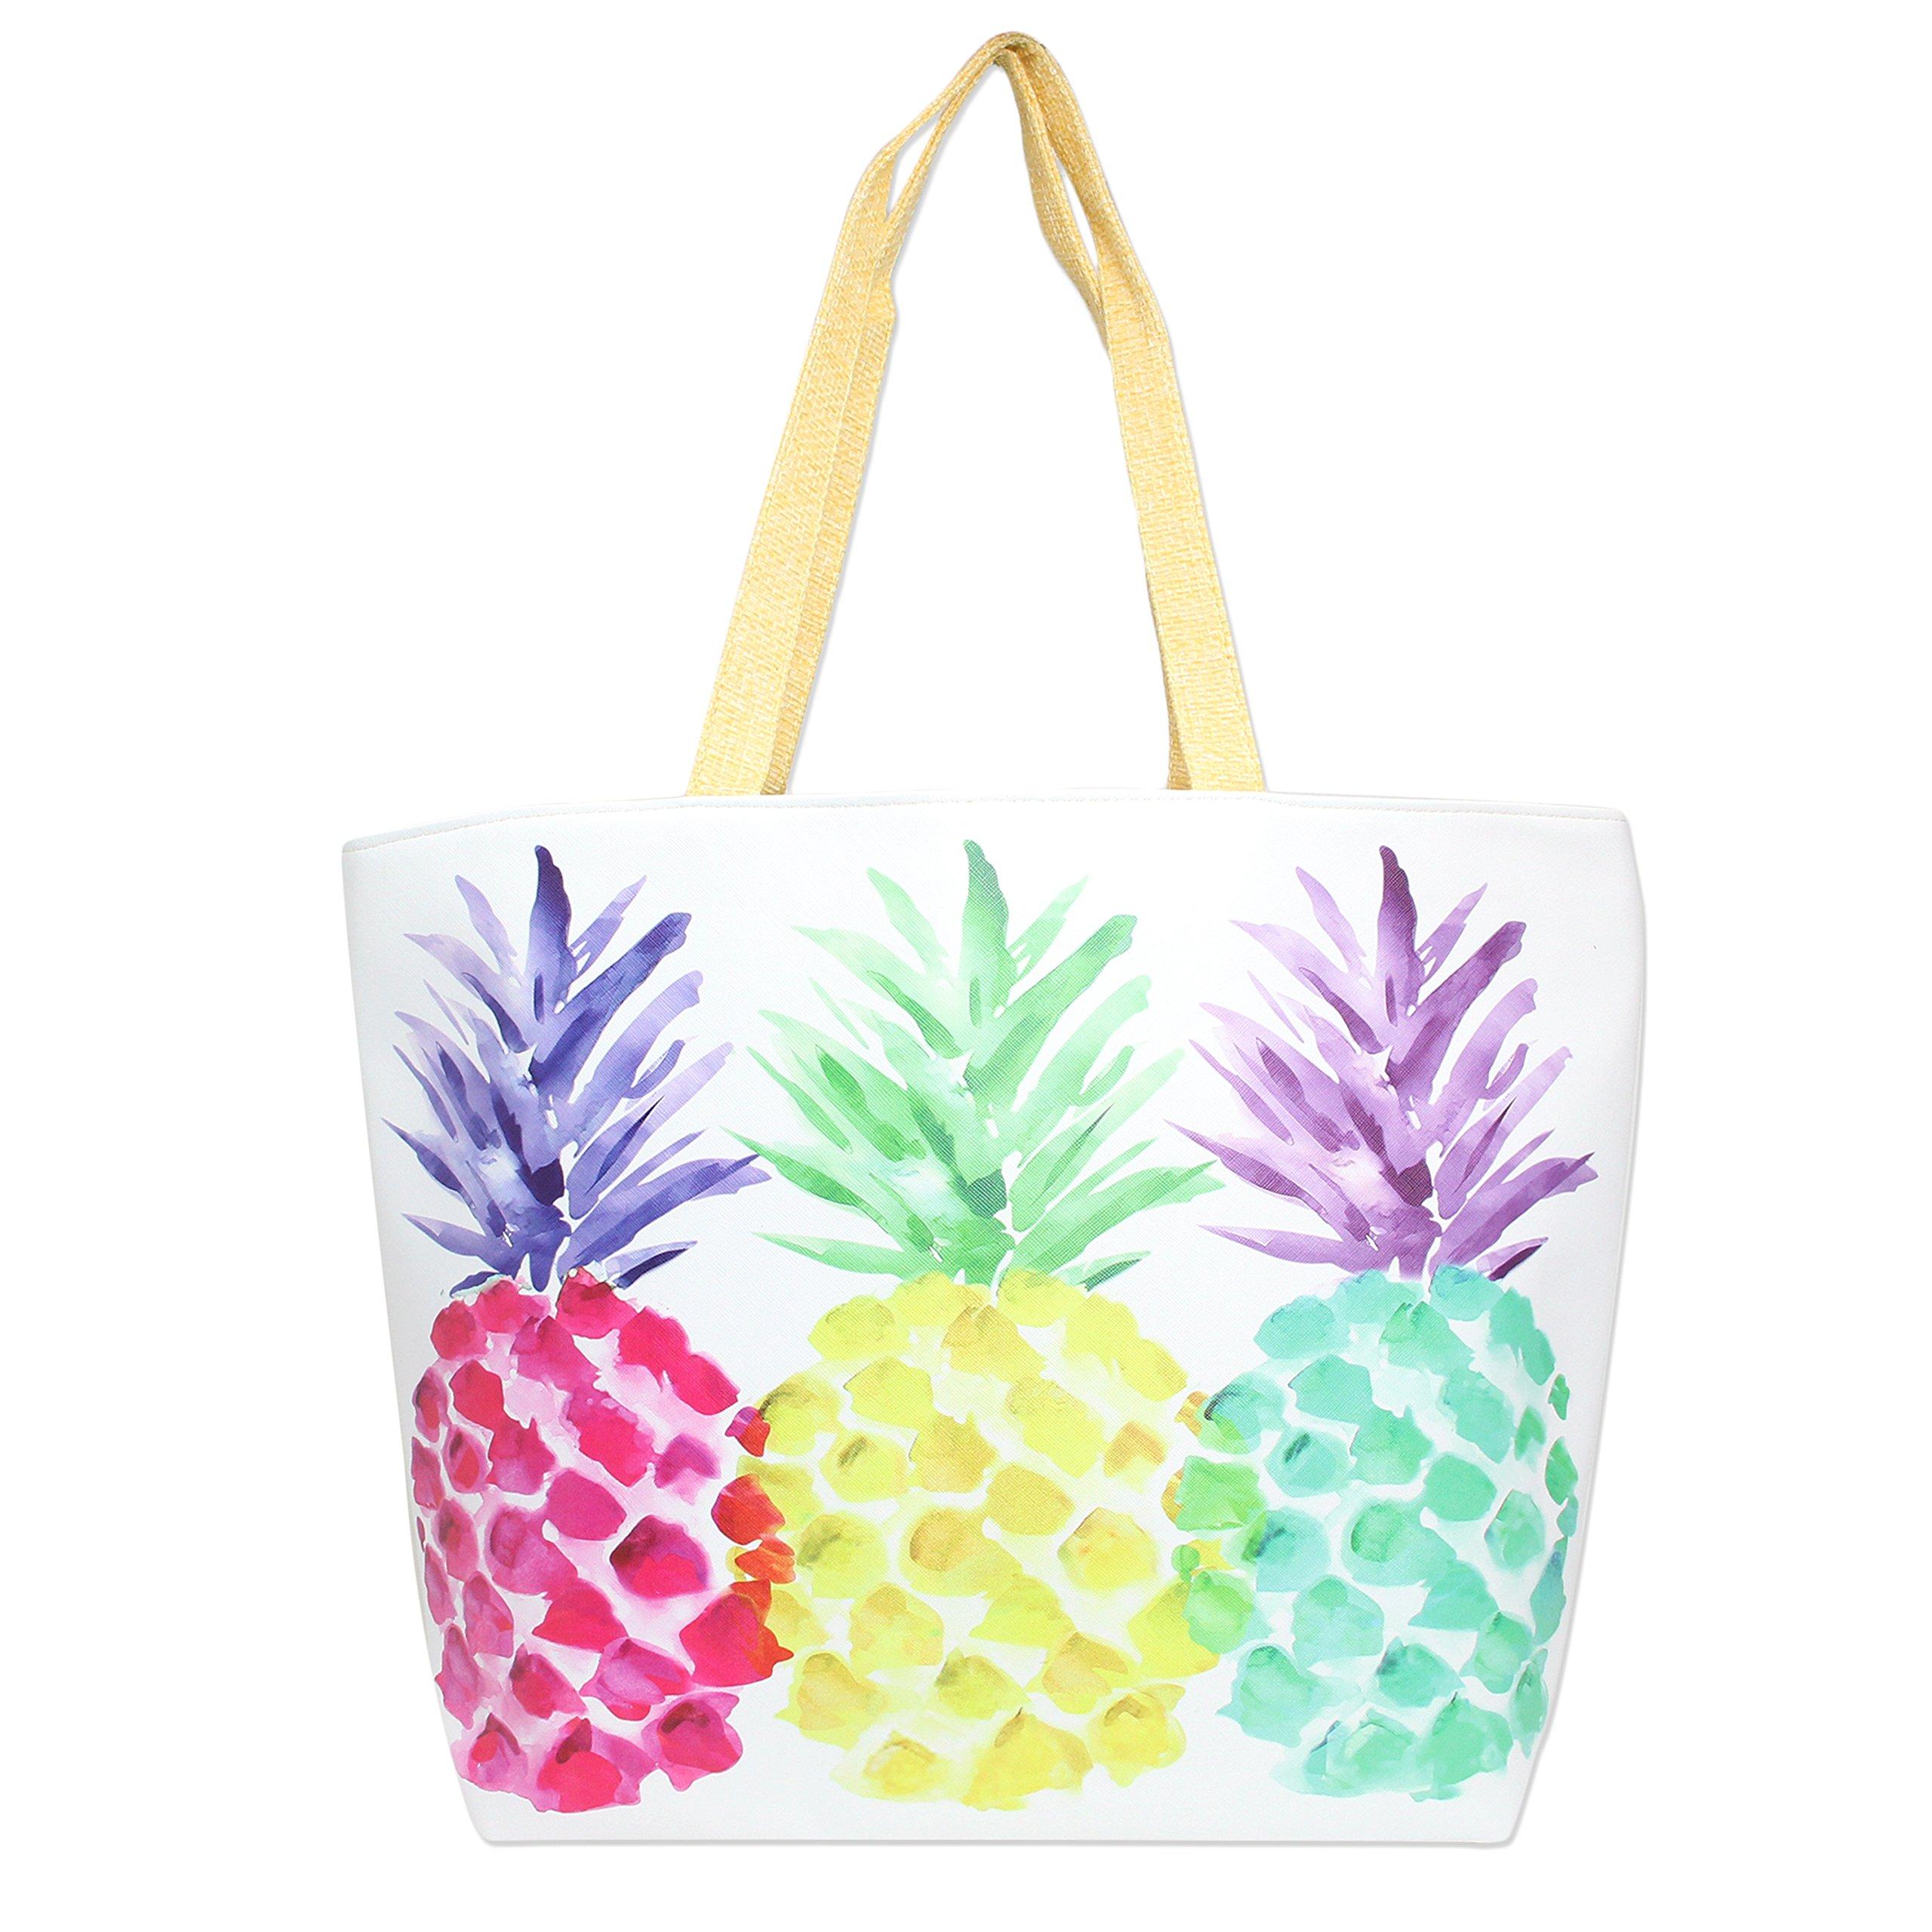 101 BEACH Colorful Summer Printed 18 inch Zipper Top Beach Tote Bag (Colorful Pineapple Print)